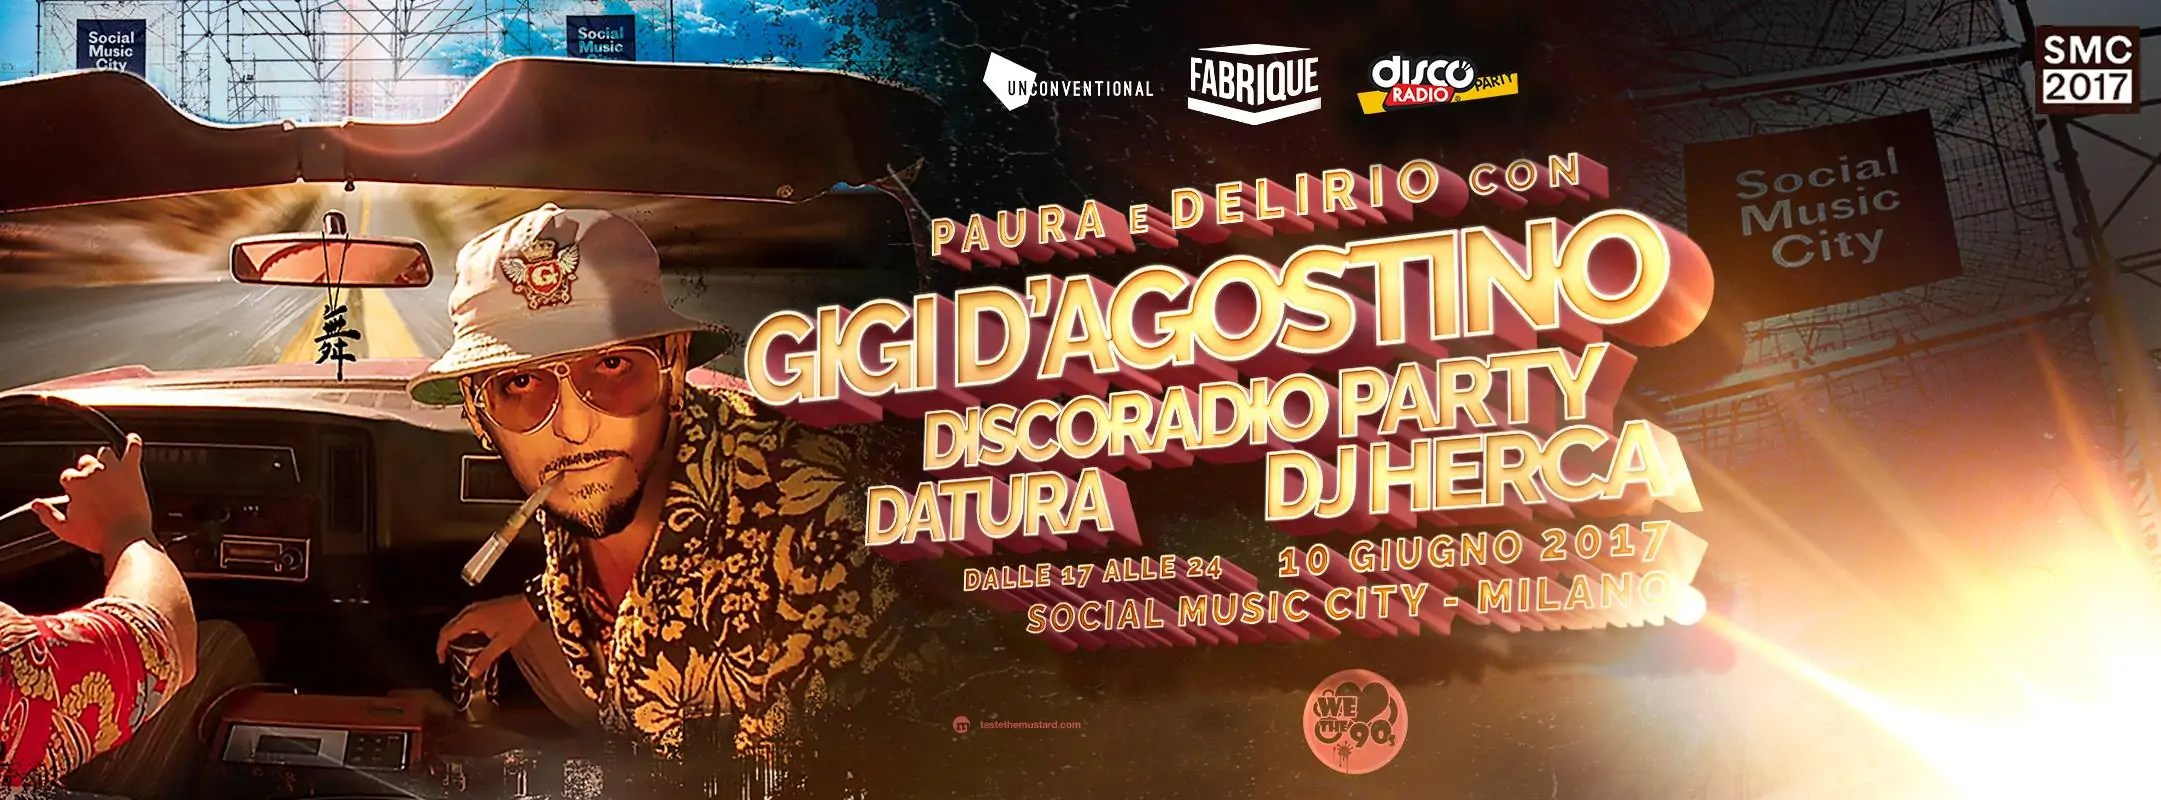 GIGI D'AGOSTINO SOCIAL MUSIC CITY 10 06 2017 MILANO Prezzi Ticket Biglietti Liste Tavoli Pacchetti Hotel Bus